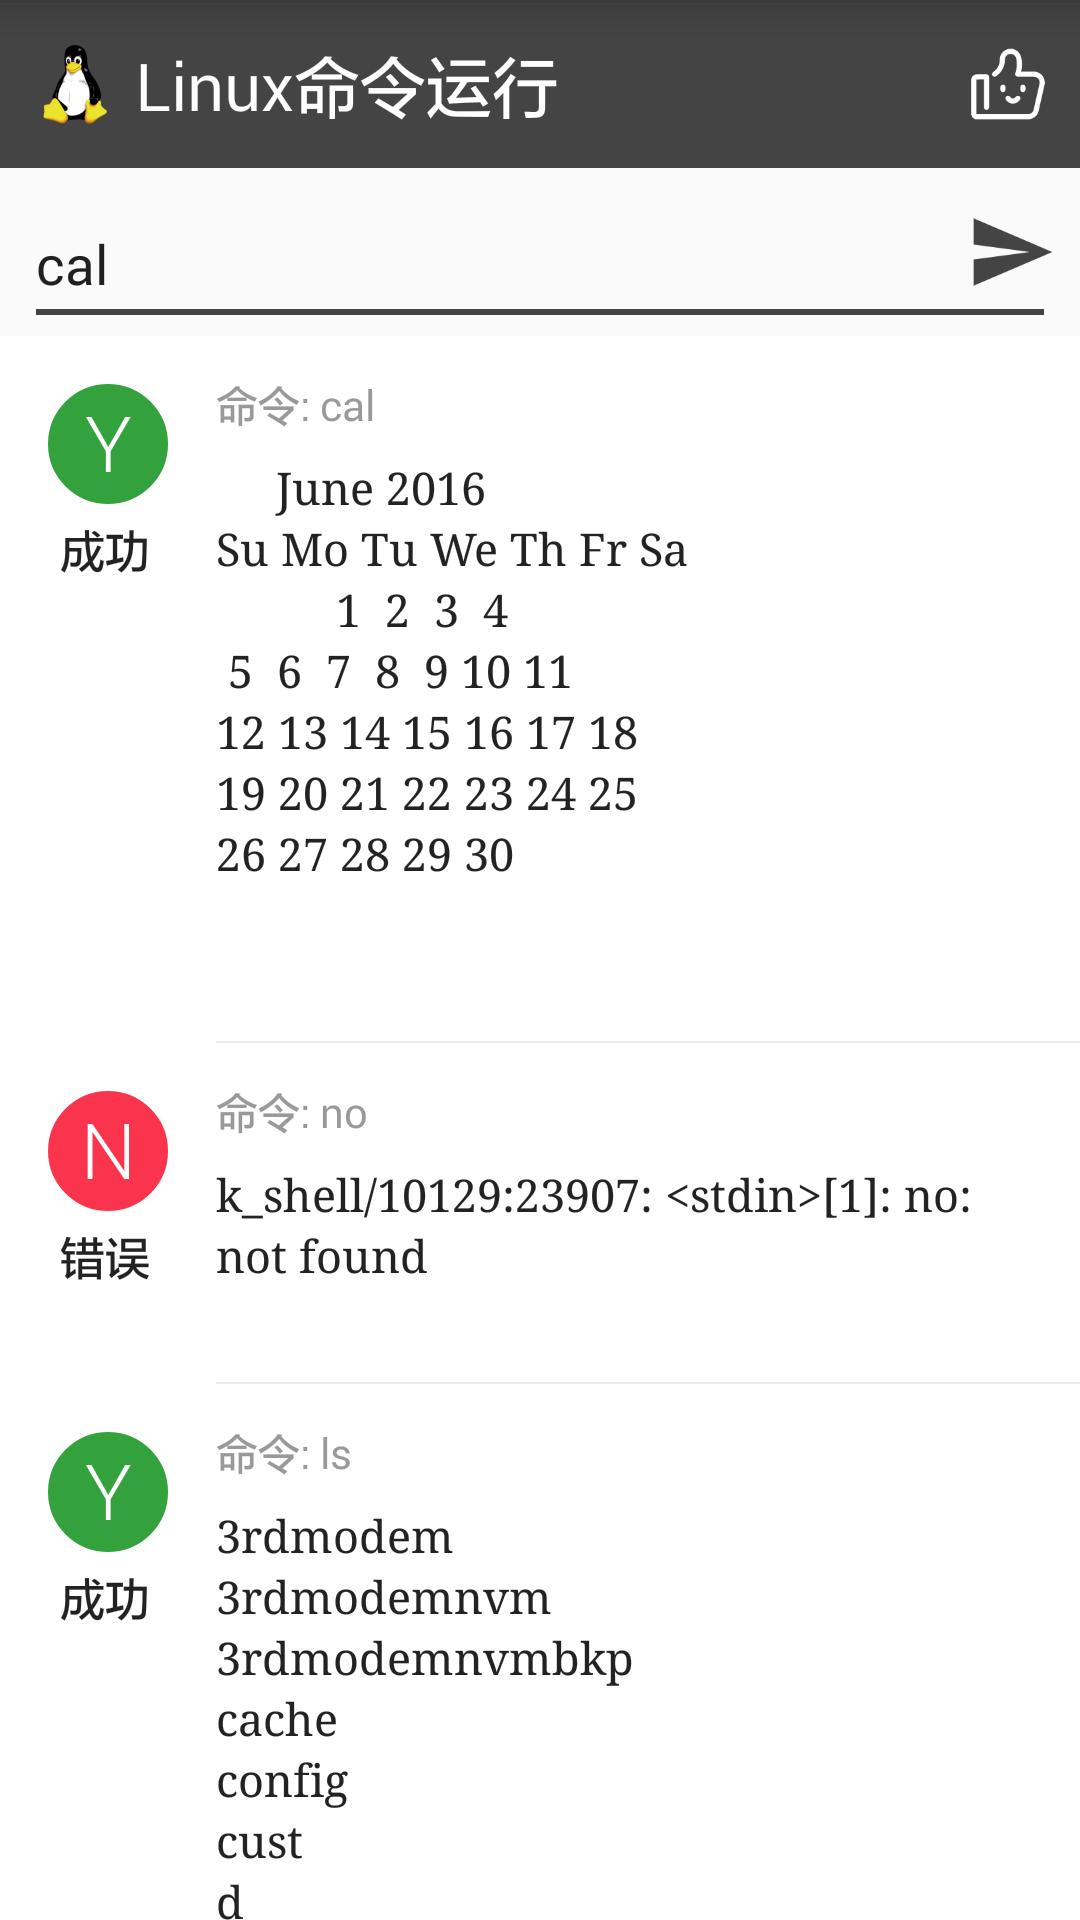 Linux命令运行截图2